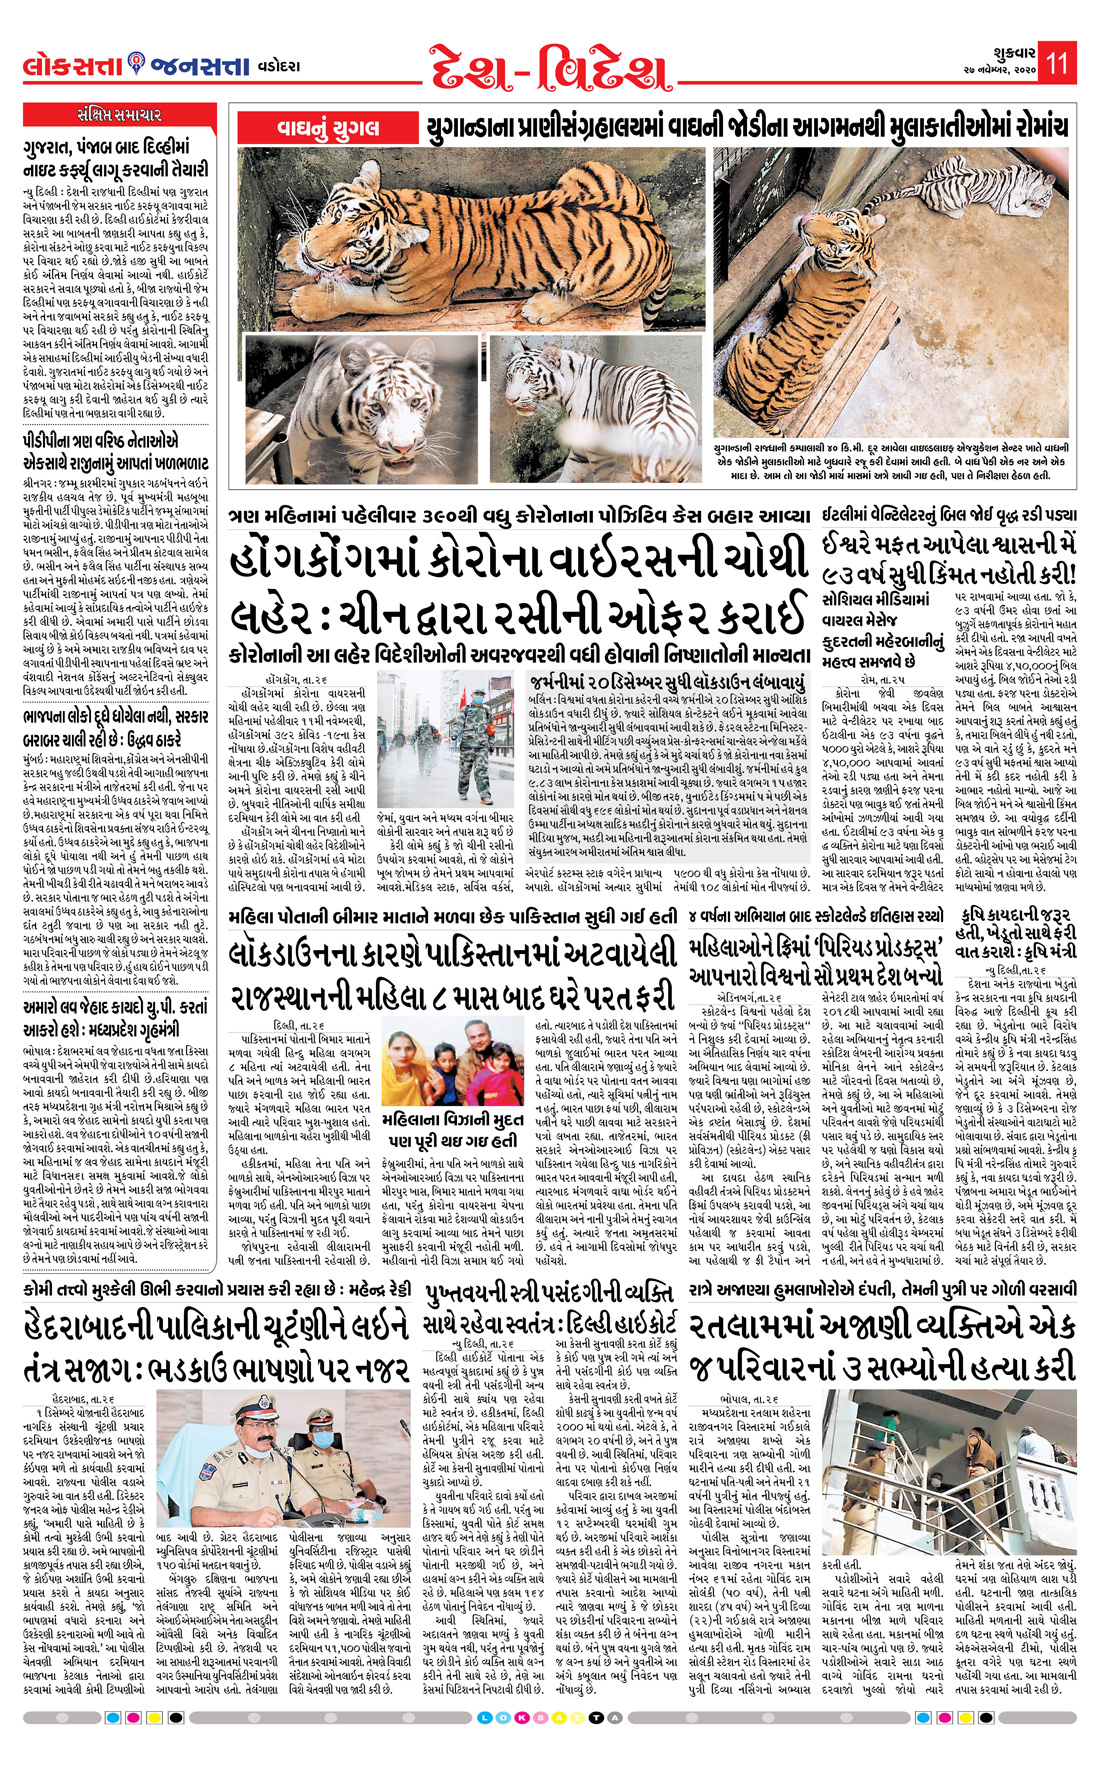 Loksatta Jansatta News Papaer E-paper dated 2020-11-27 | Page 12